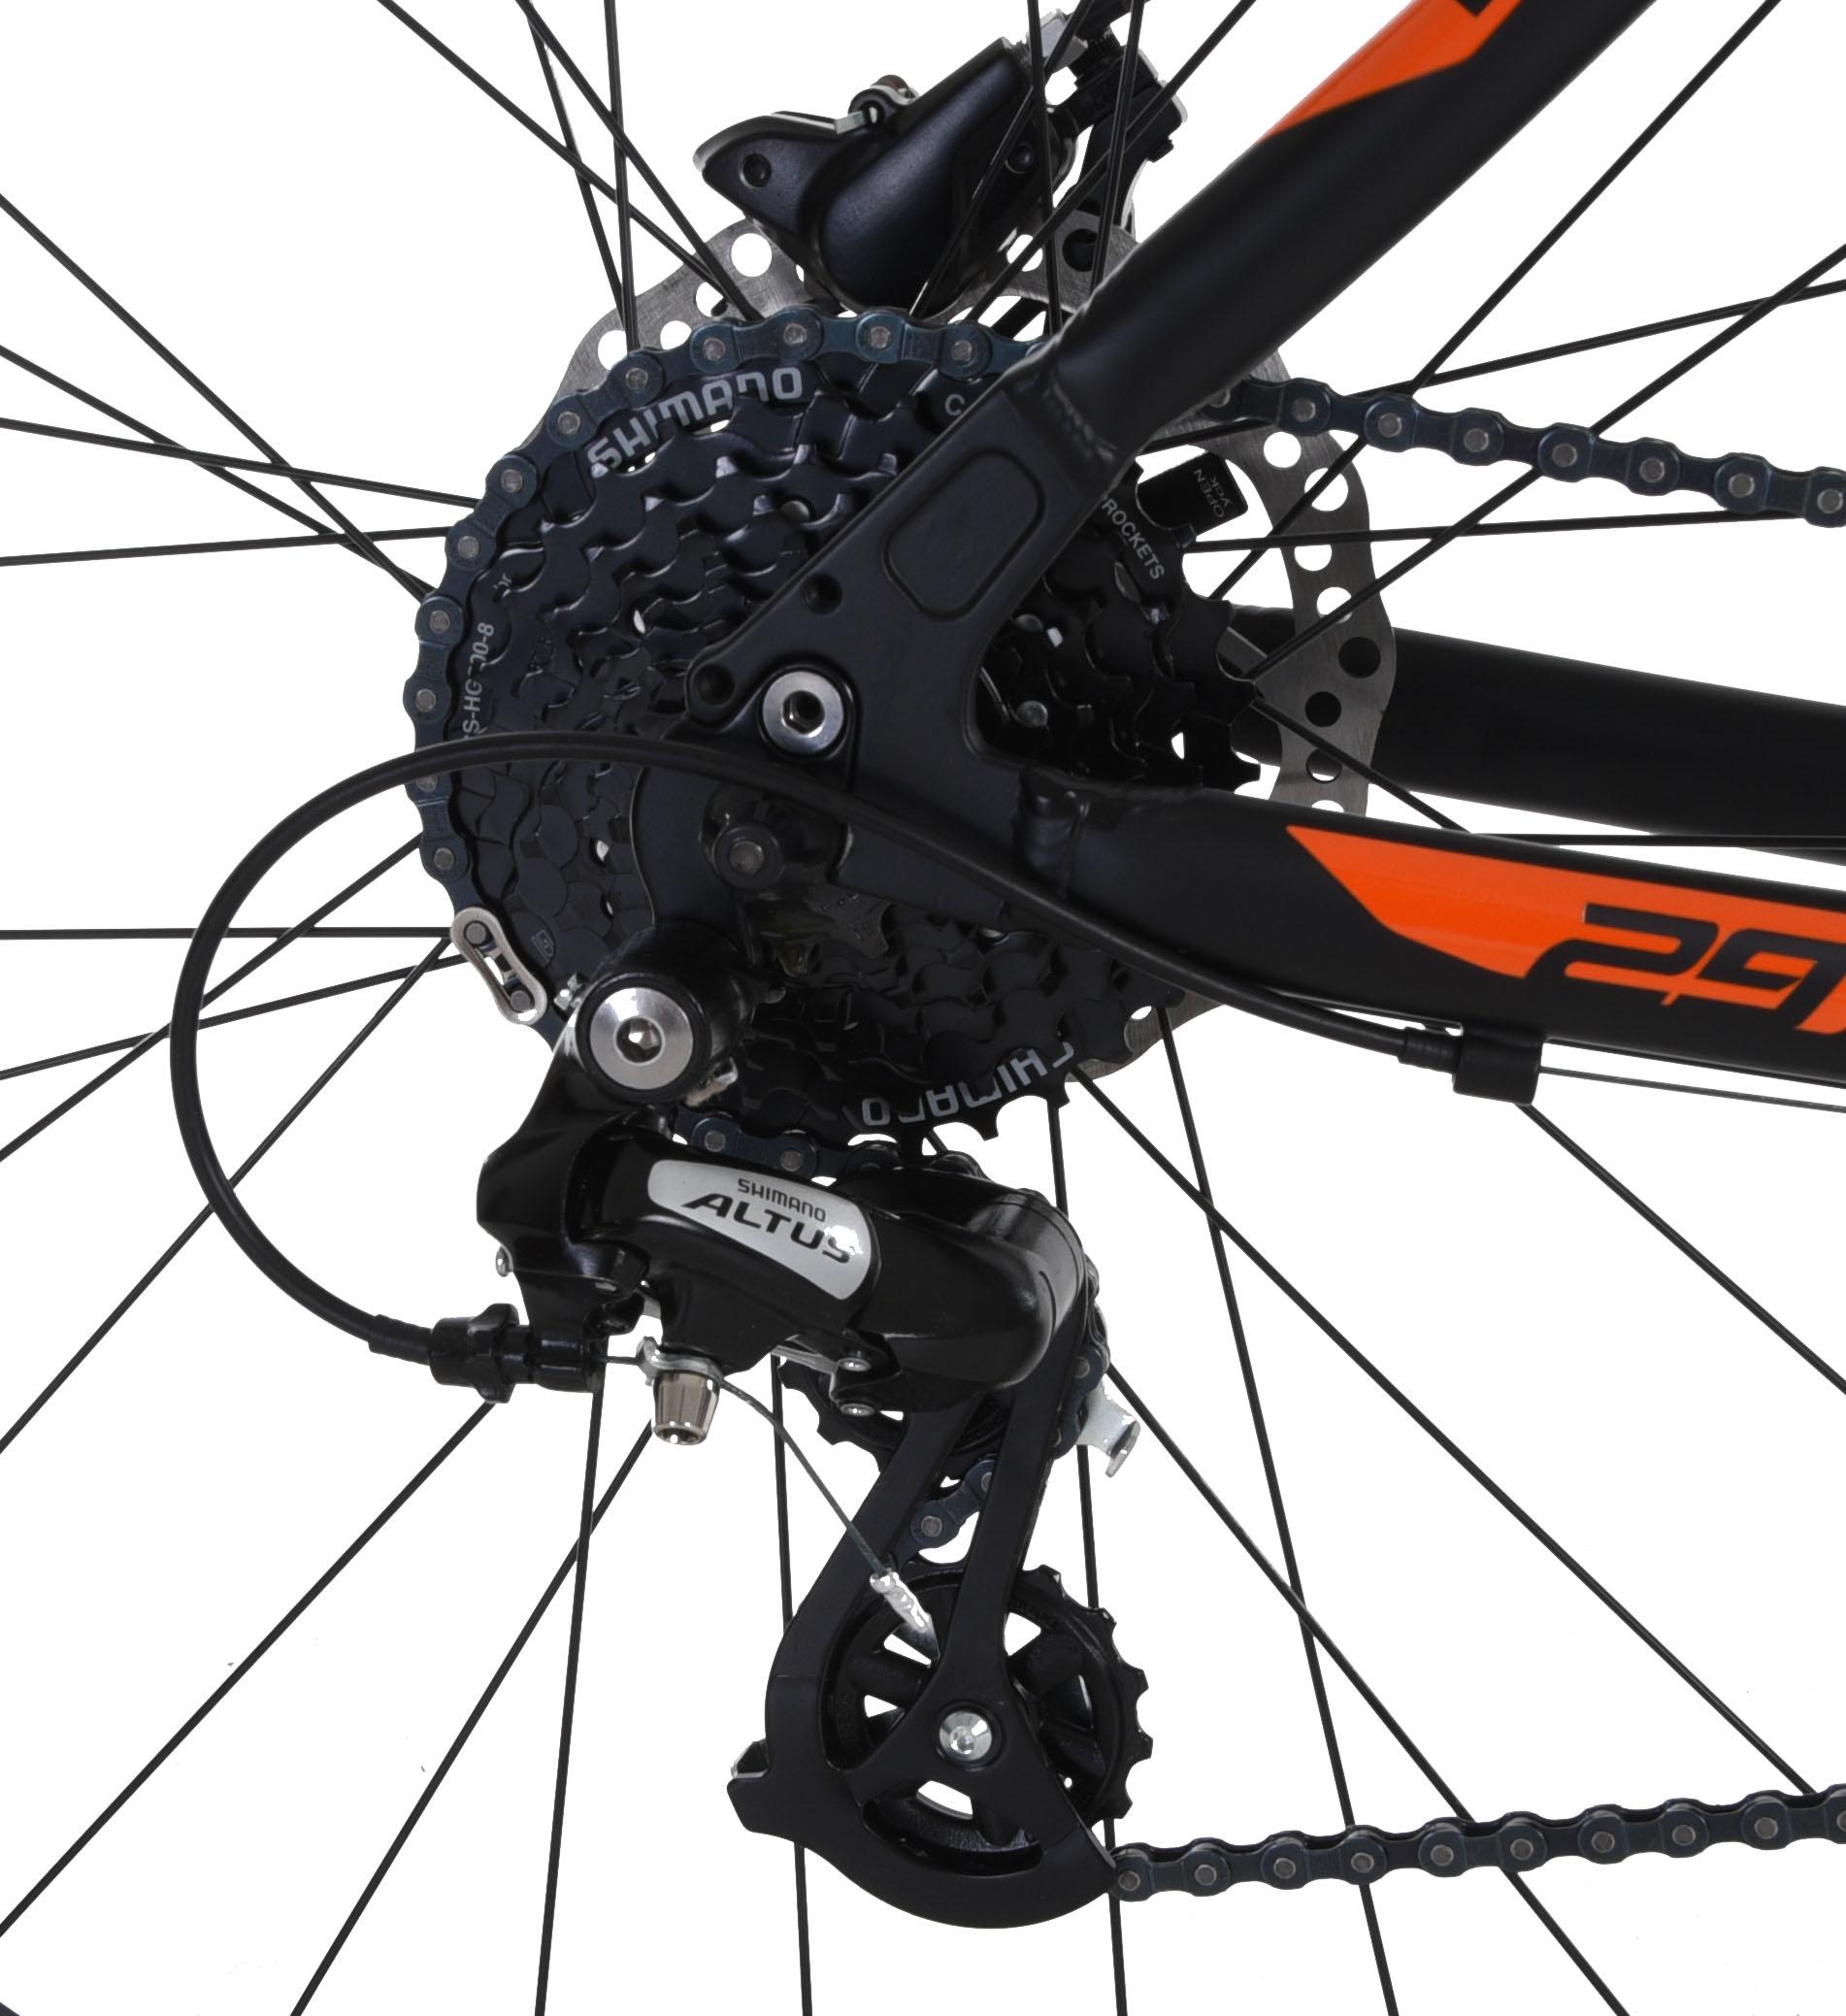 thumbnail 15 - COBRA 29er Mountain Bike 24 Speed MTB with 29-Inch Wheels